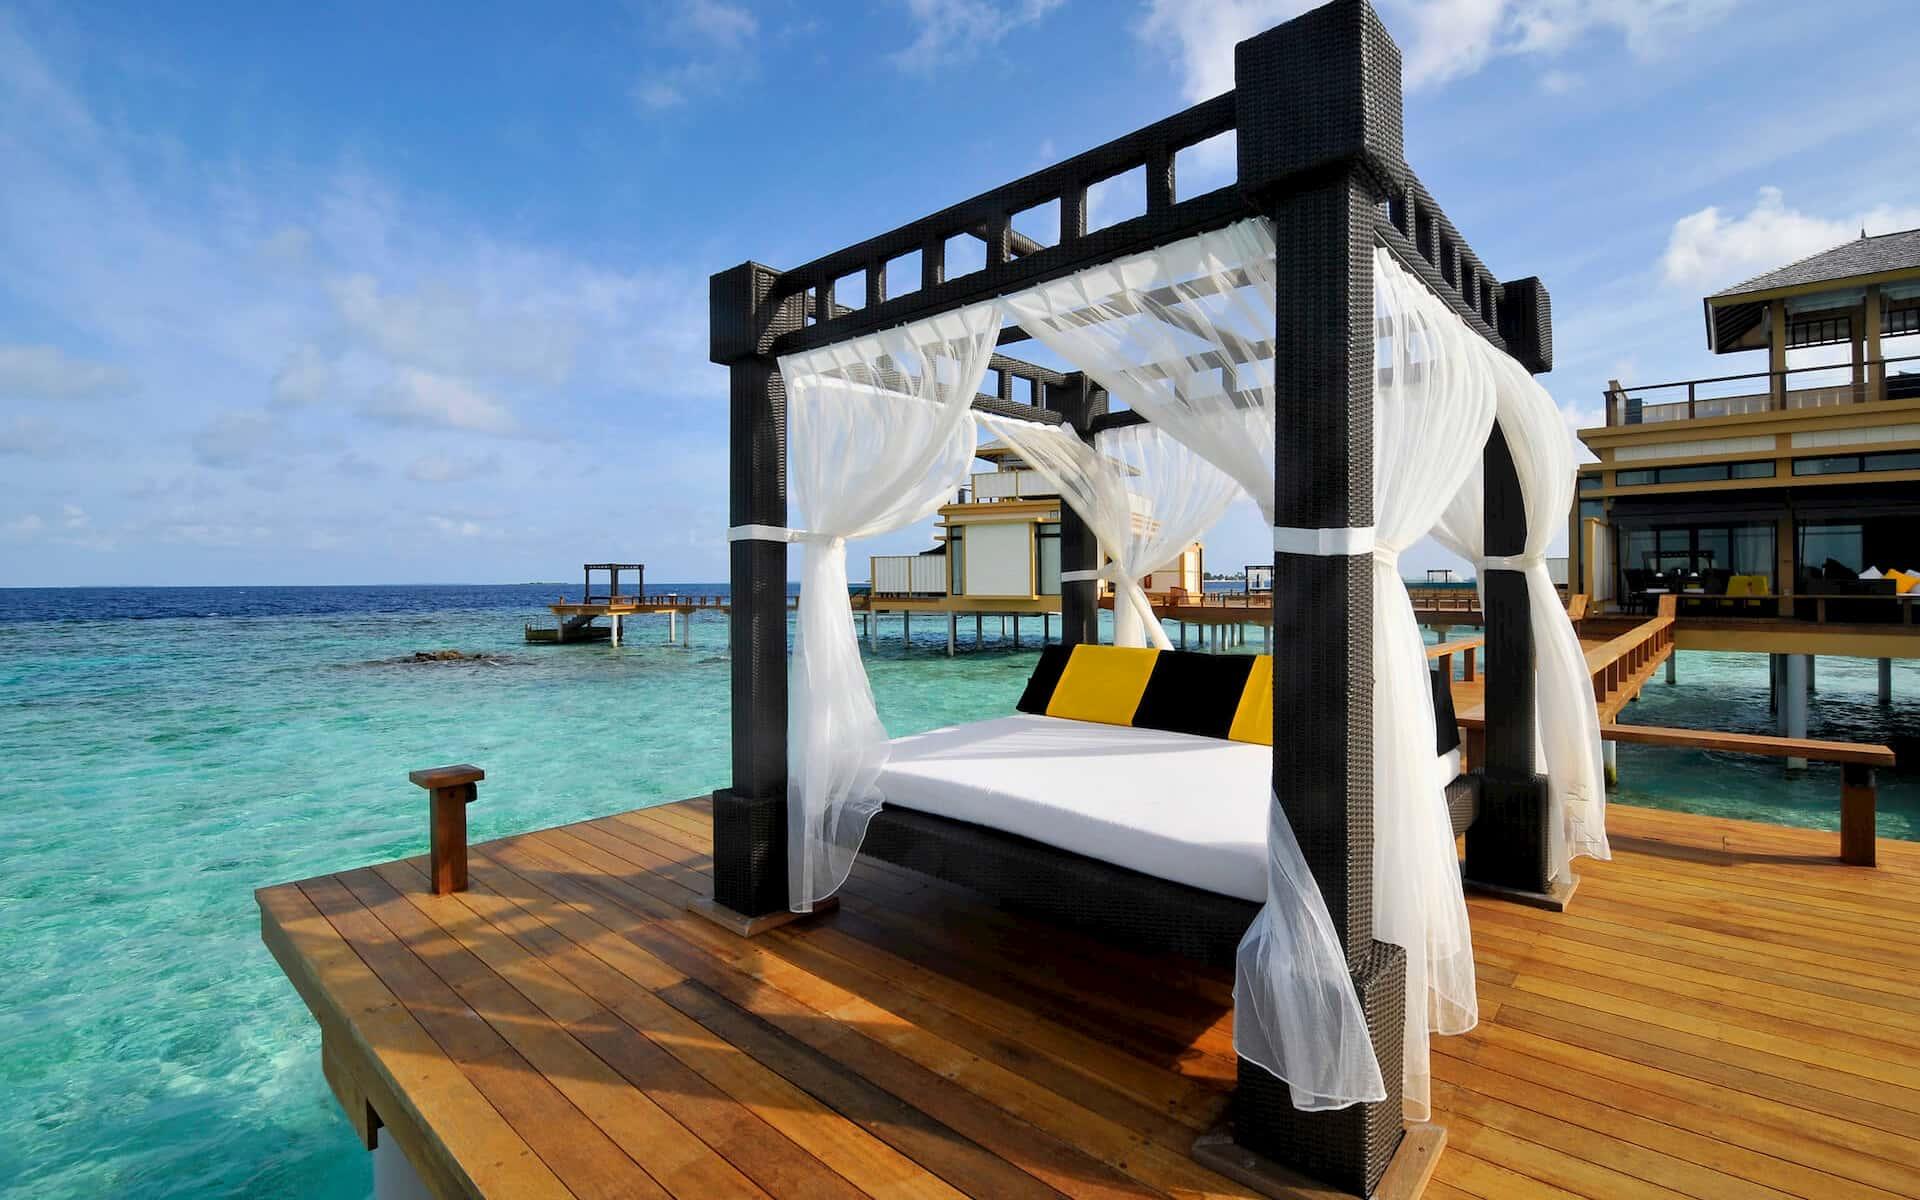 Angsana Velavaru resort Maldive InOcean pool villa with sala